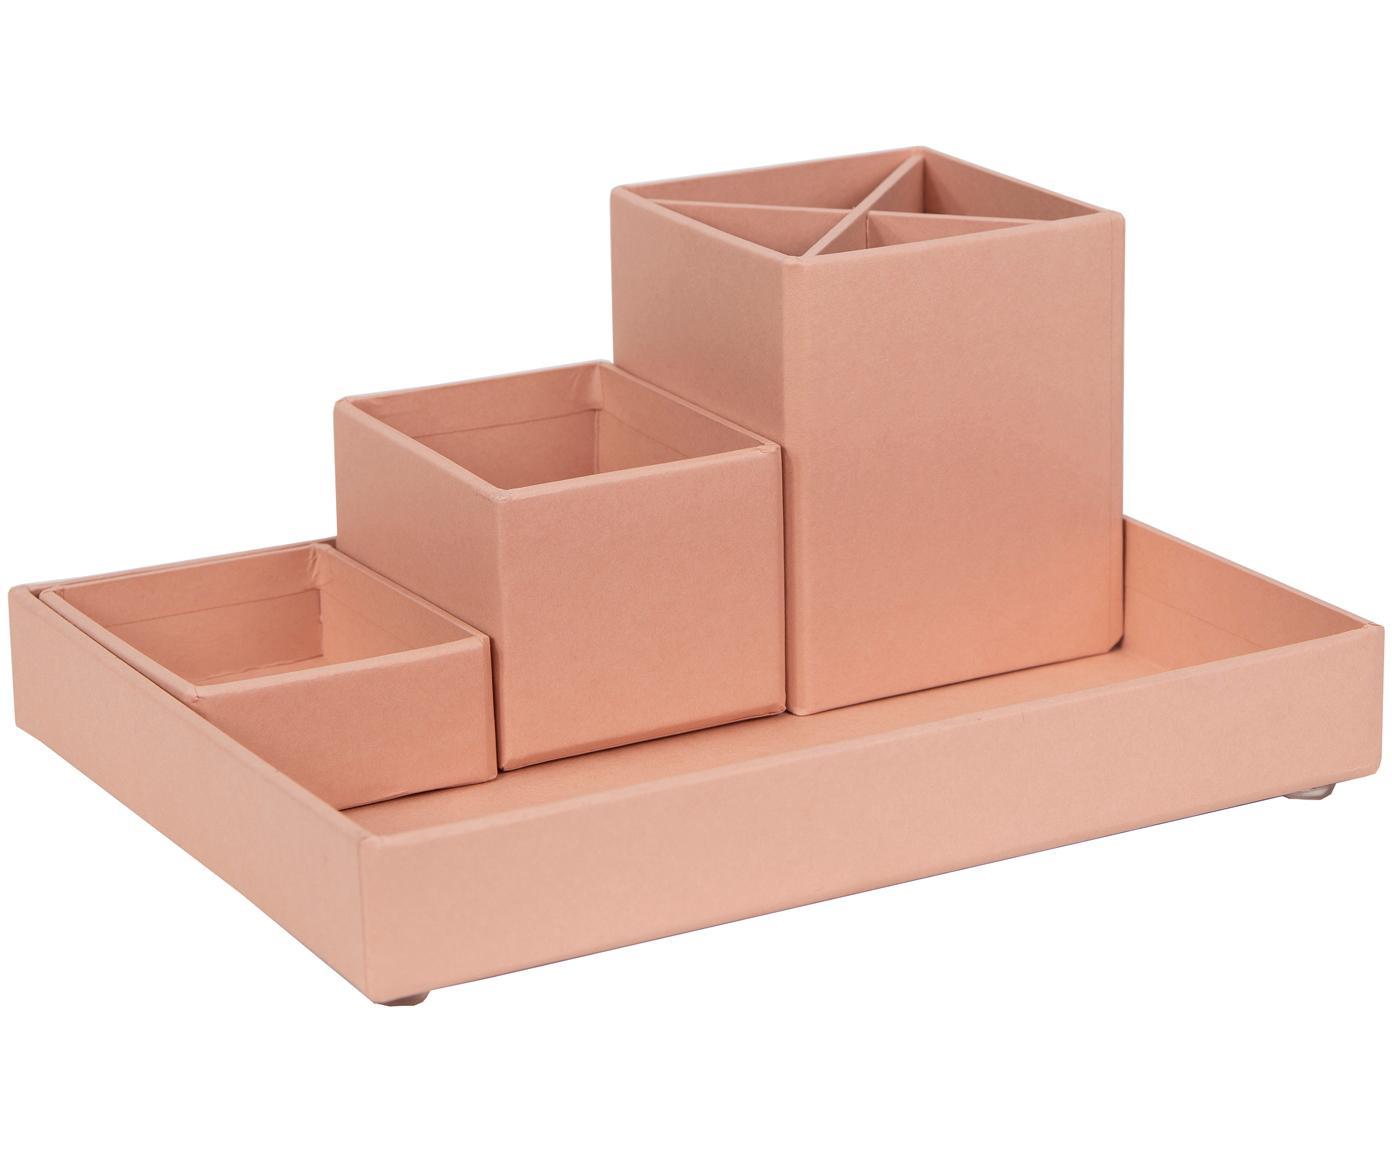 Bureau organizerset Lena, 4-delig, Massief, gelamineerd karton, Oudroze, Verschillende formaten